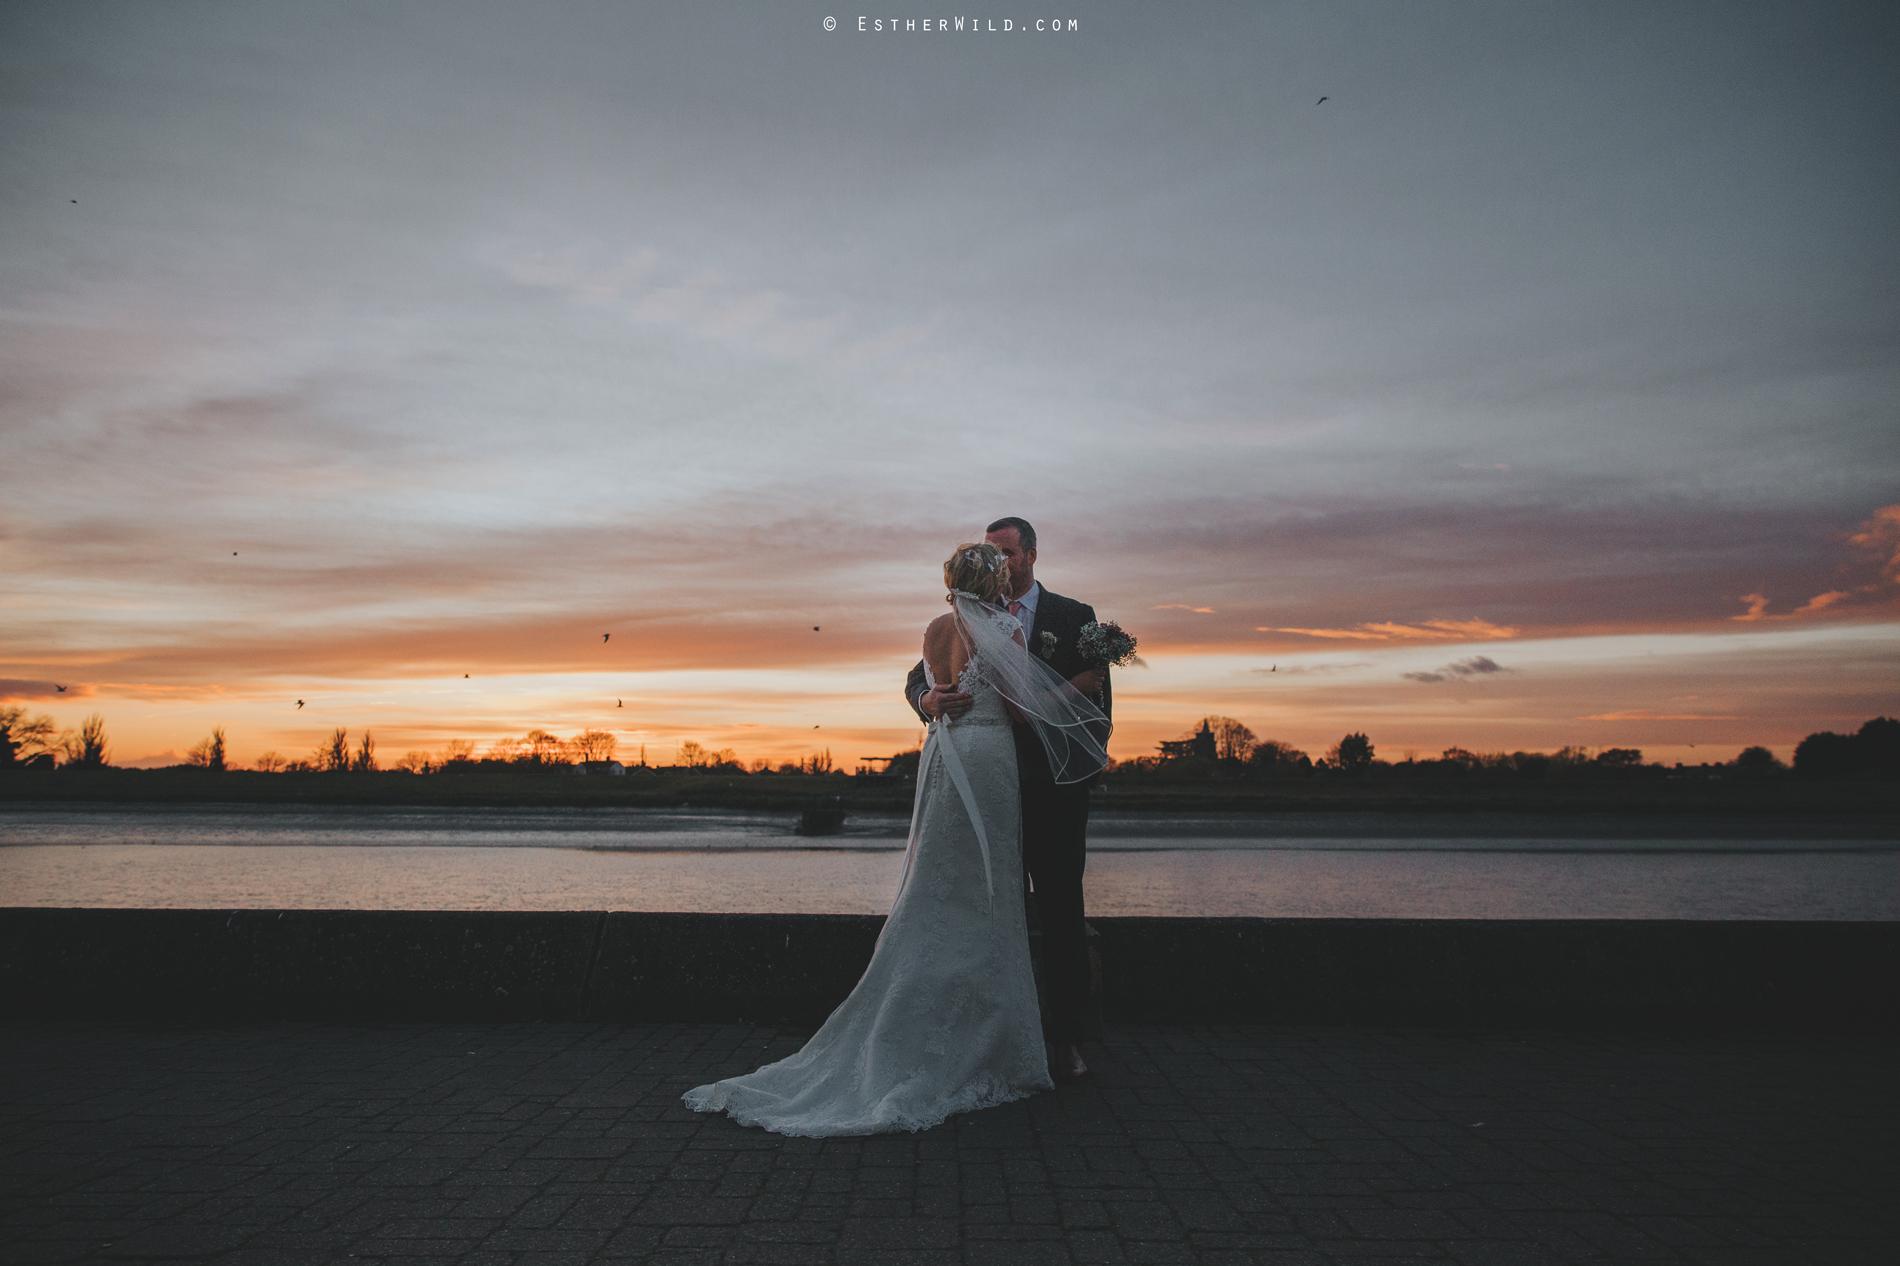 Wedding_Kings_Lynn_Town_Hall_Norfolk_Photographer_Esther_Wild_IMG_1285.jpg